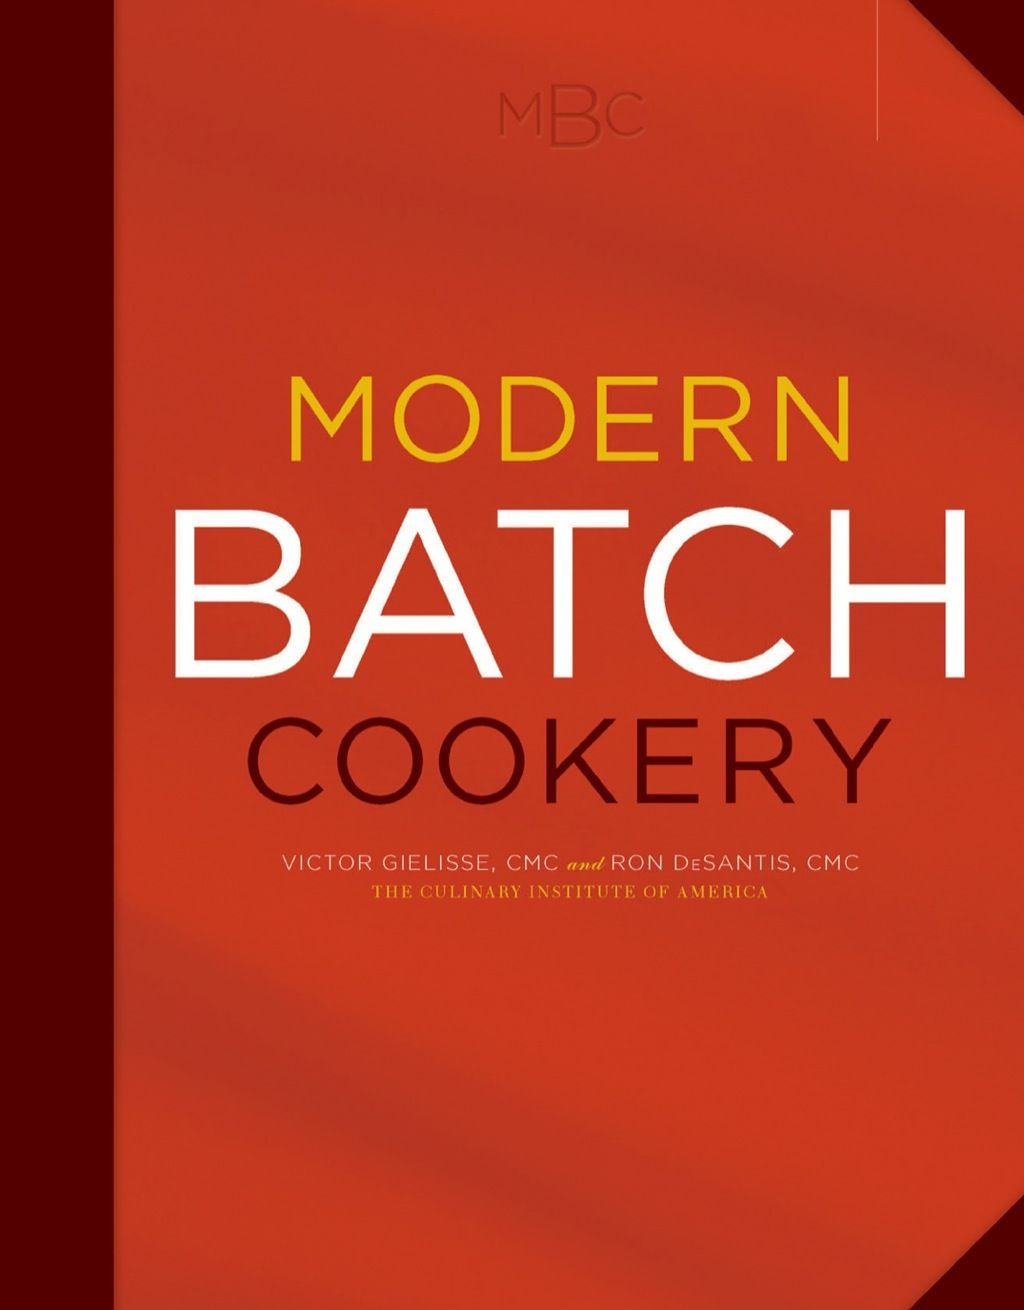 Modern Batch Cookery Ebook Rental Cookery Books Chef Cookbook